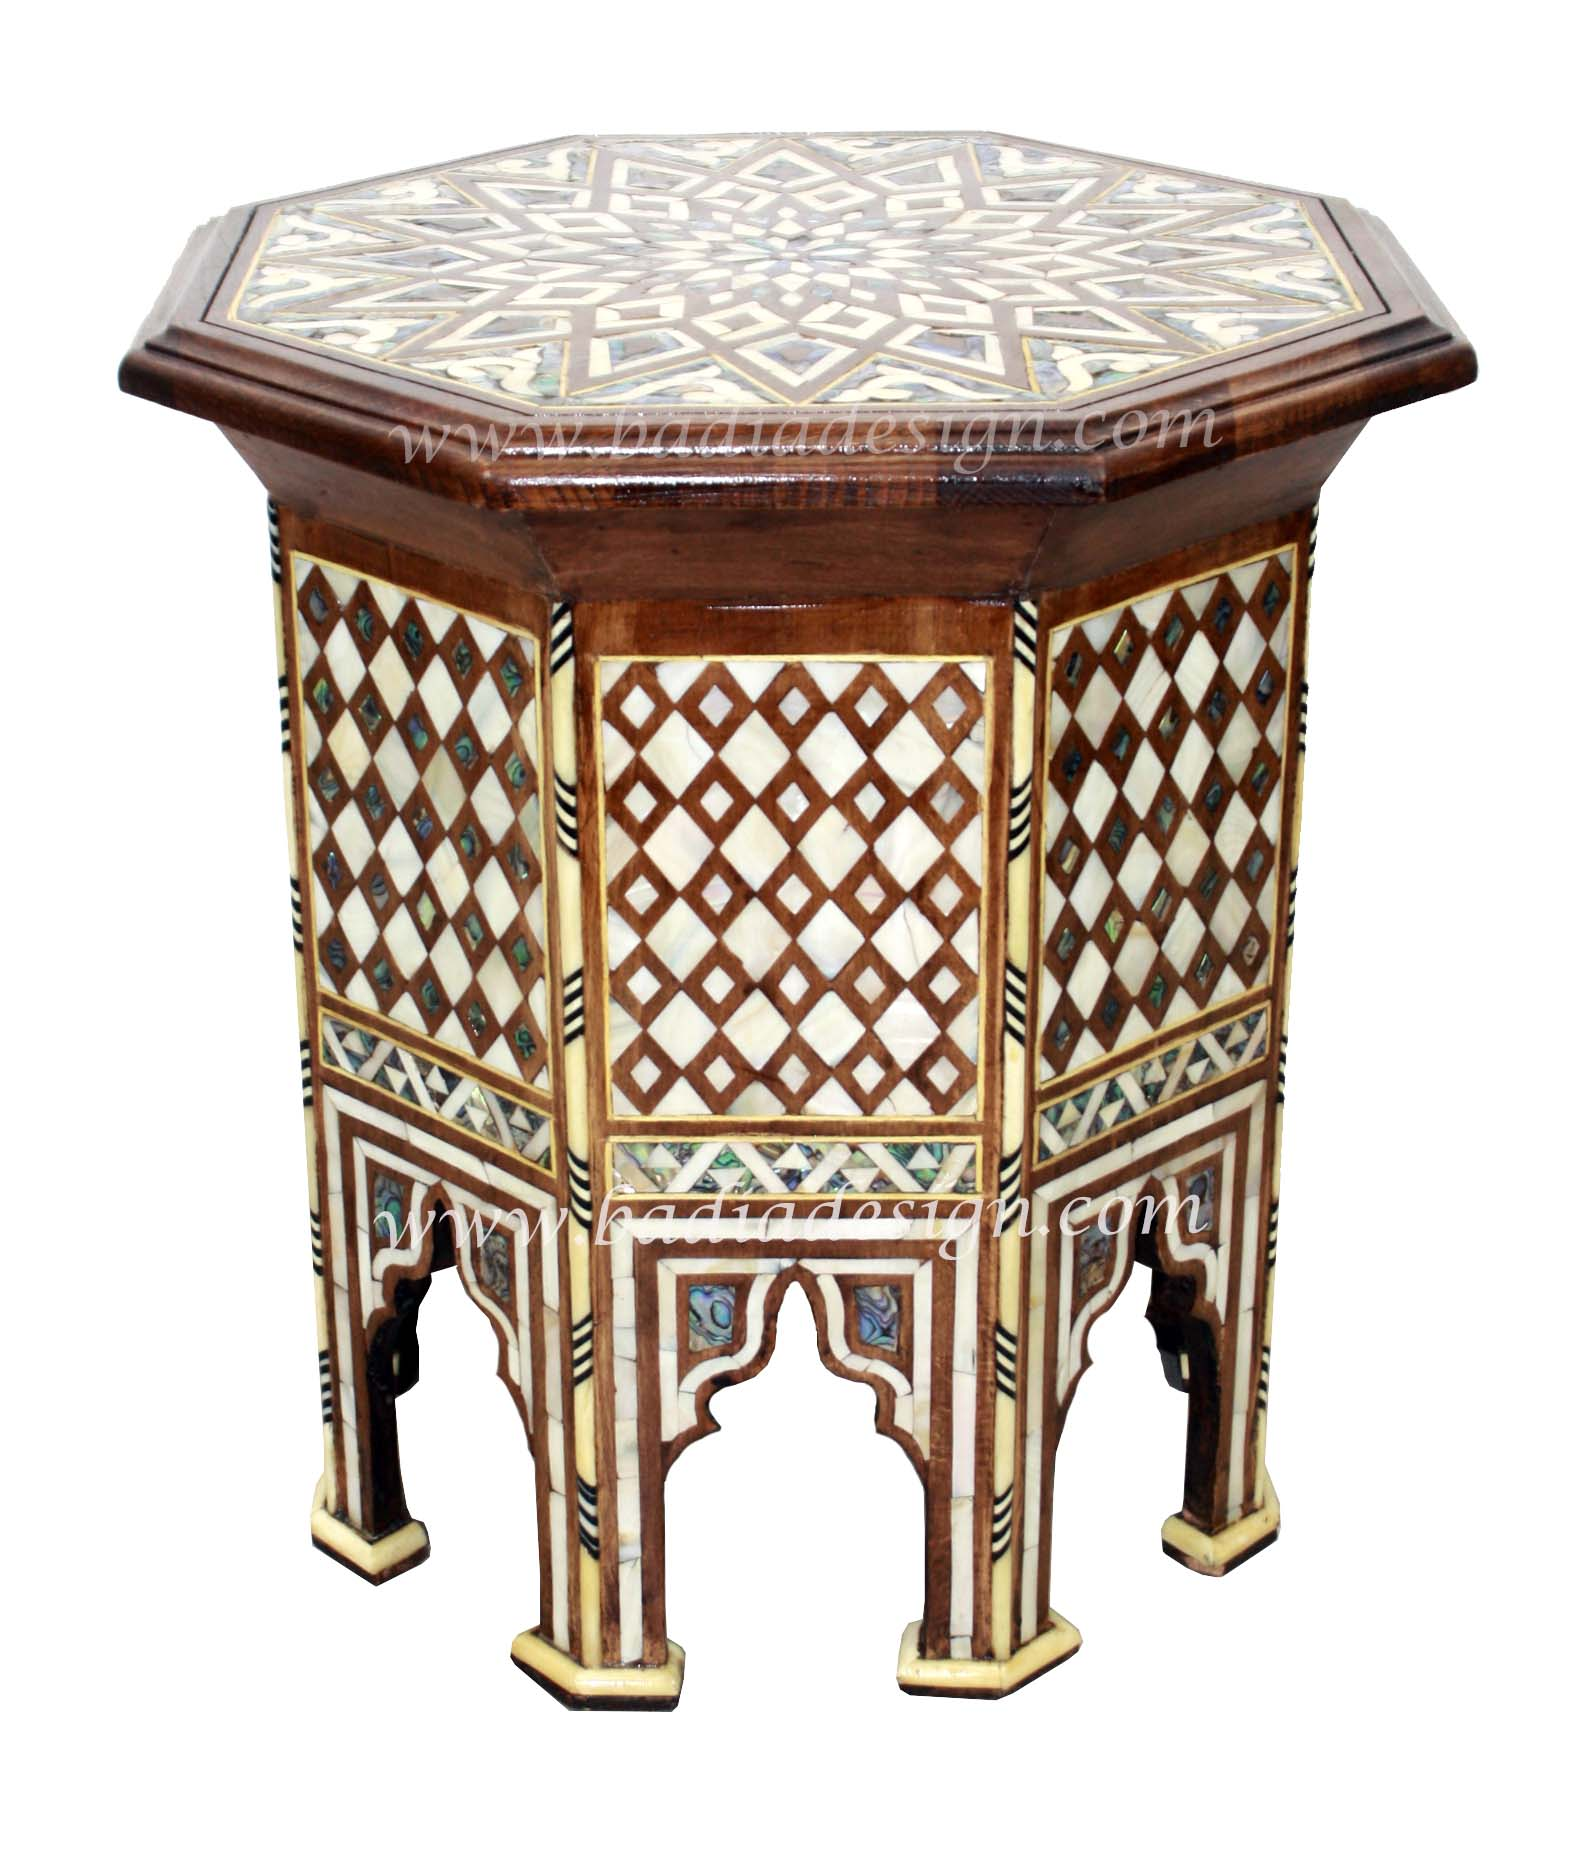 syrian-design-side-table-mop-st055-1.jpg